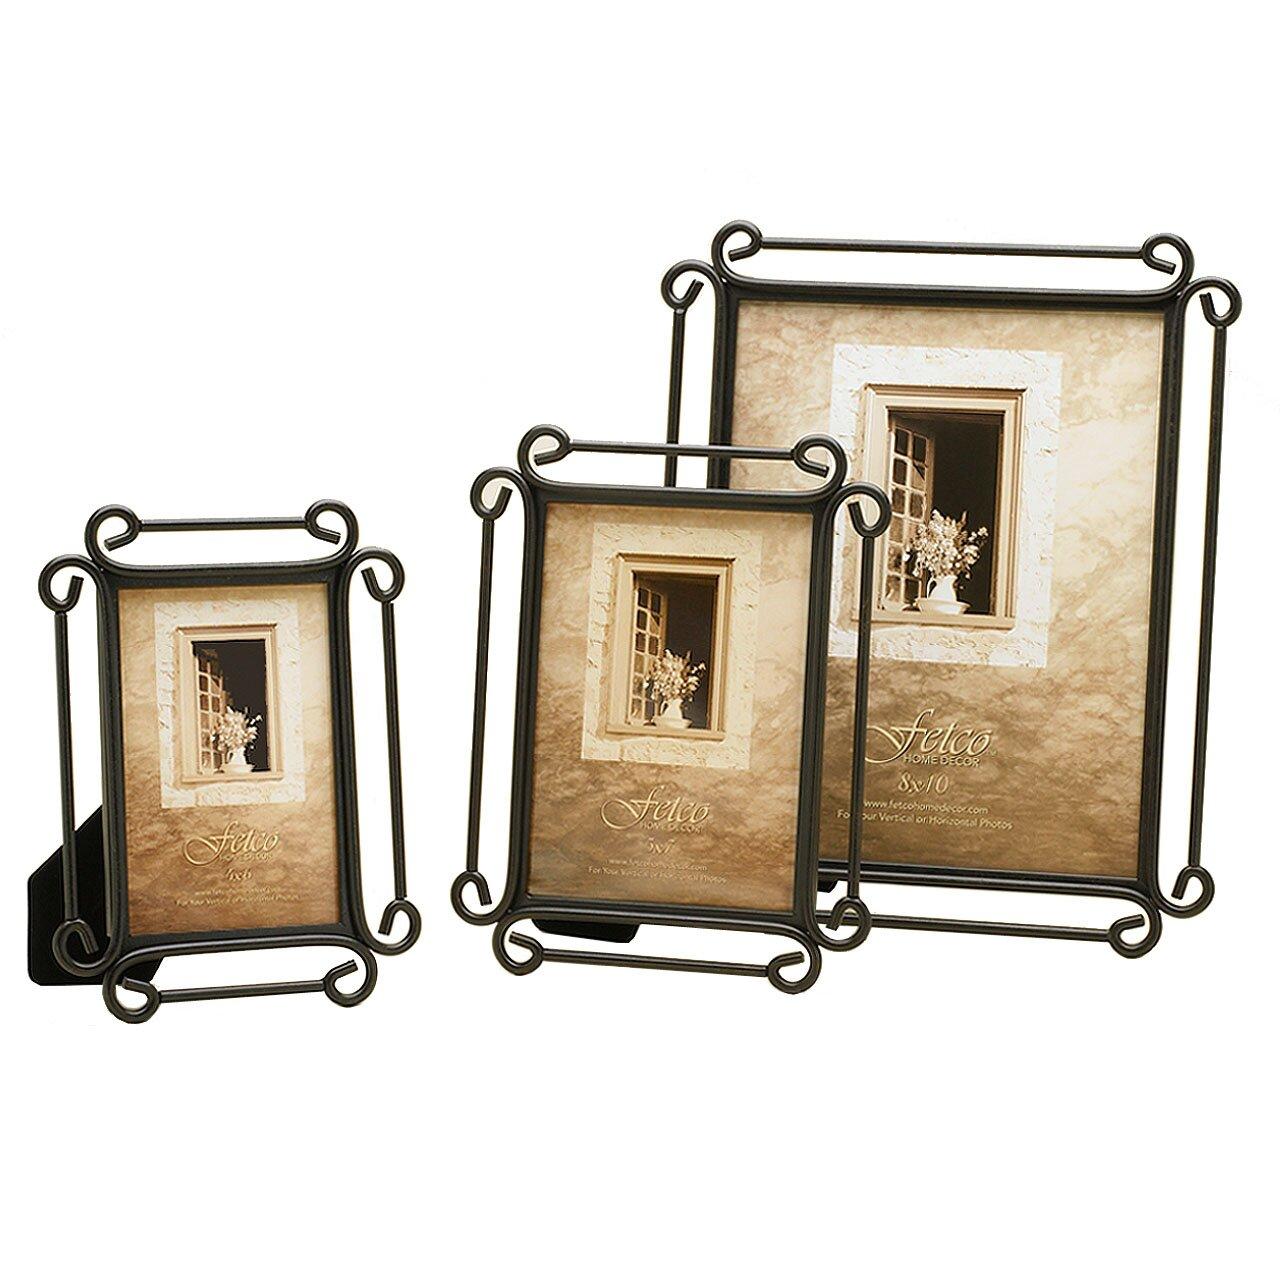 Http Www Wayfair Com Fetco Home Decor Tuscan Alton Corner Scroll Picture Frame 9102 Fhk1175 Html